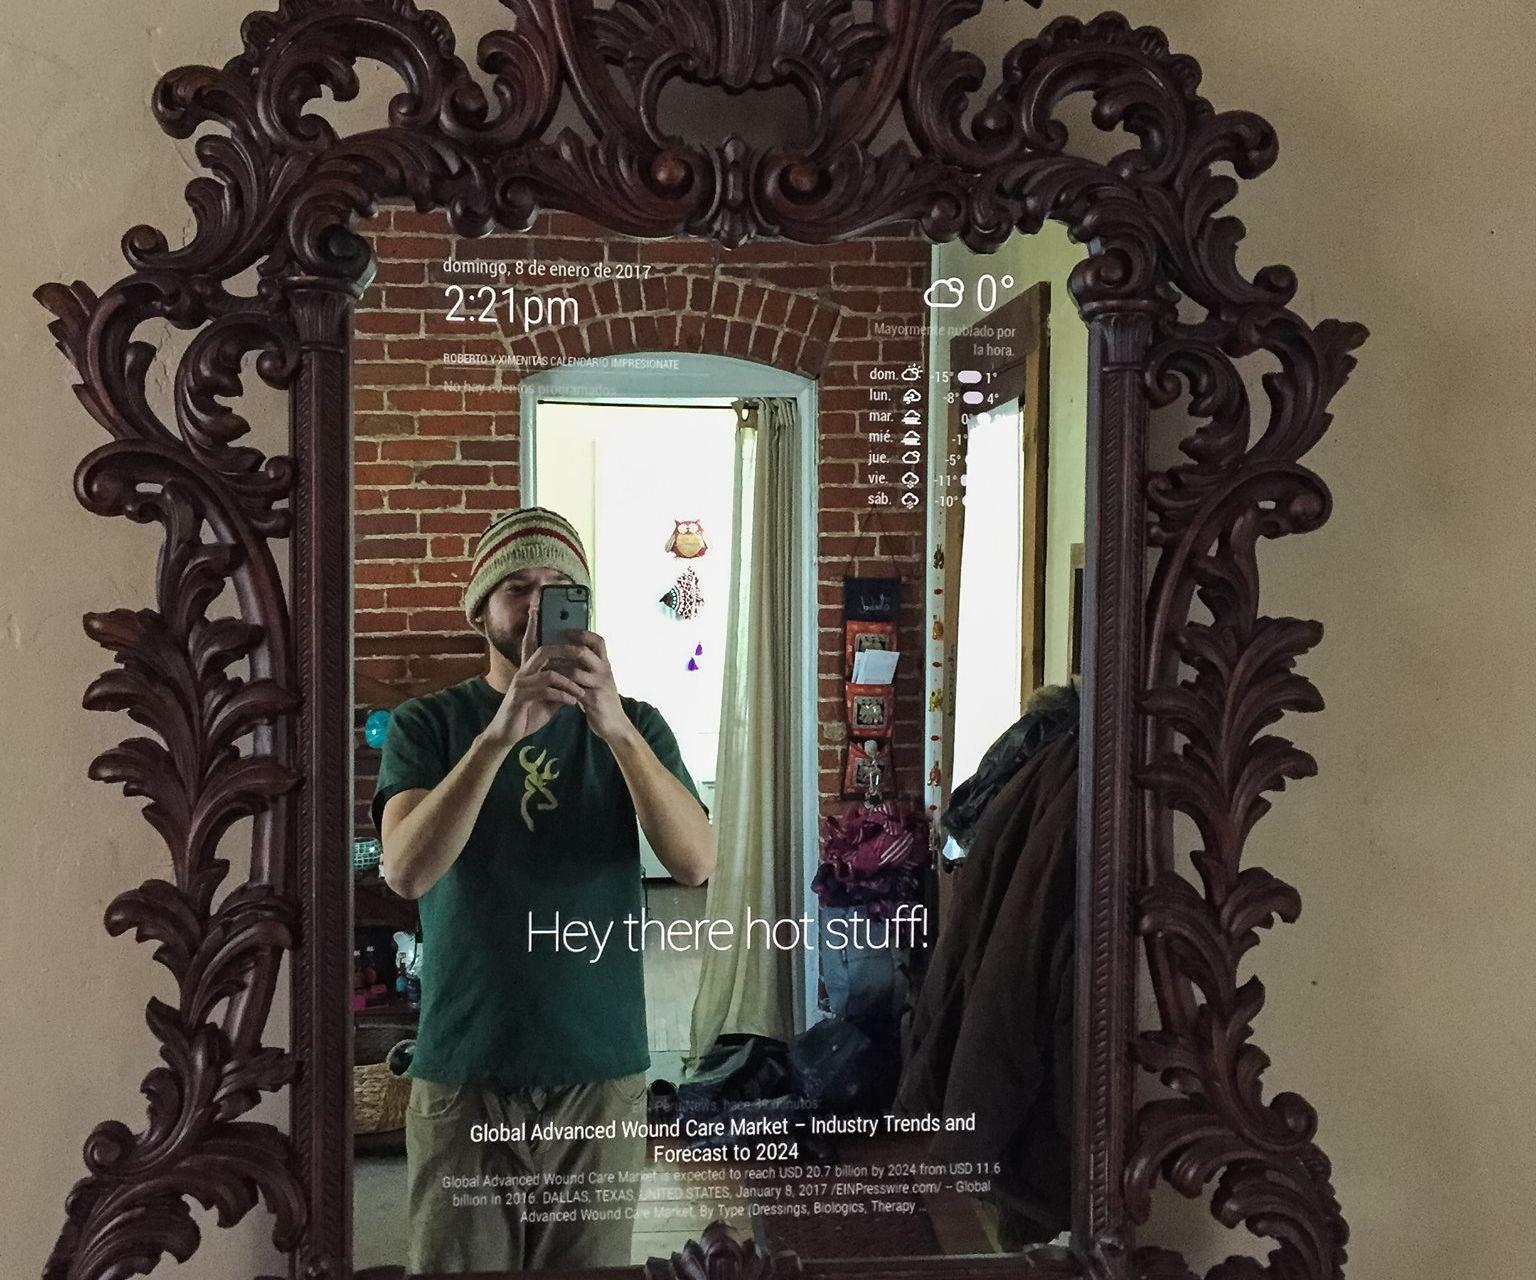 Ornate Magic Mirror